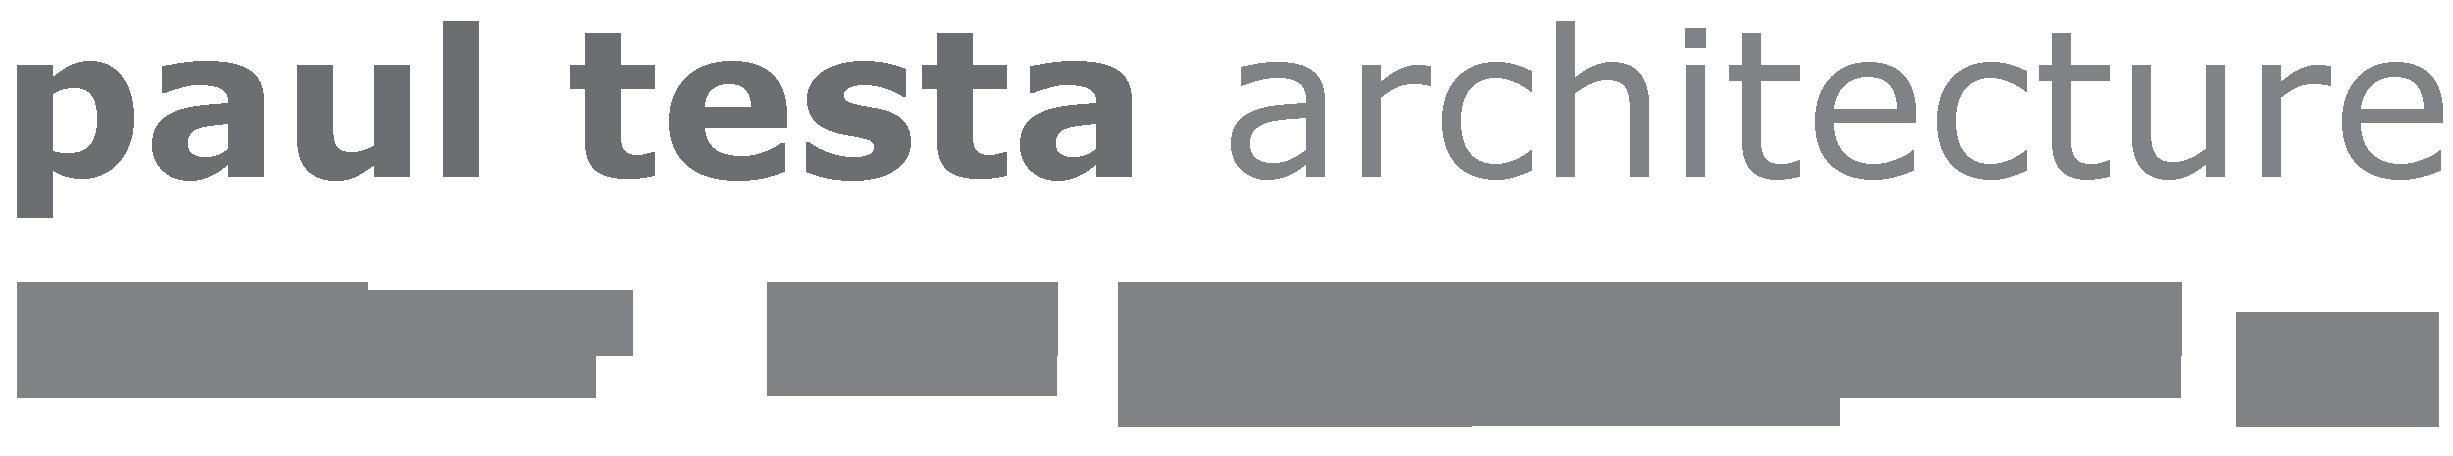 Paul Testa Architecture